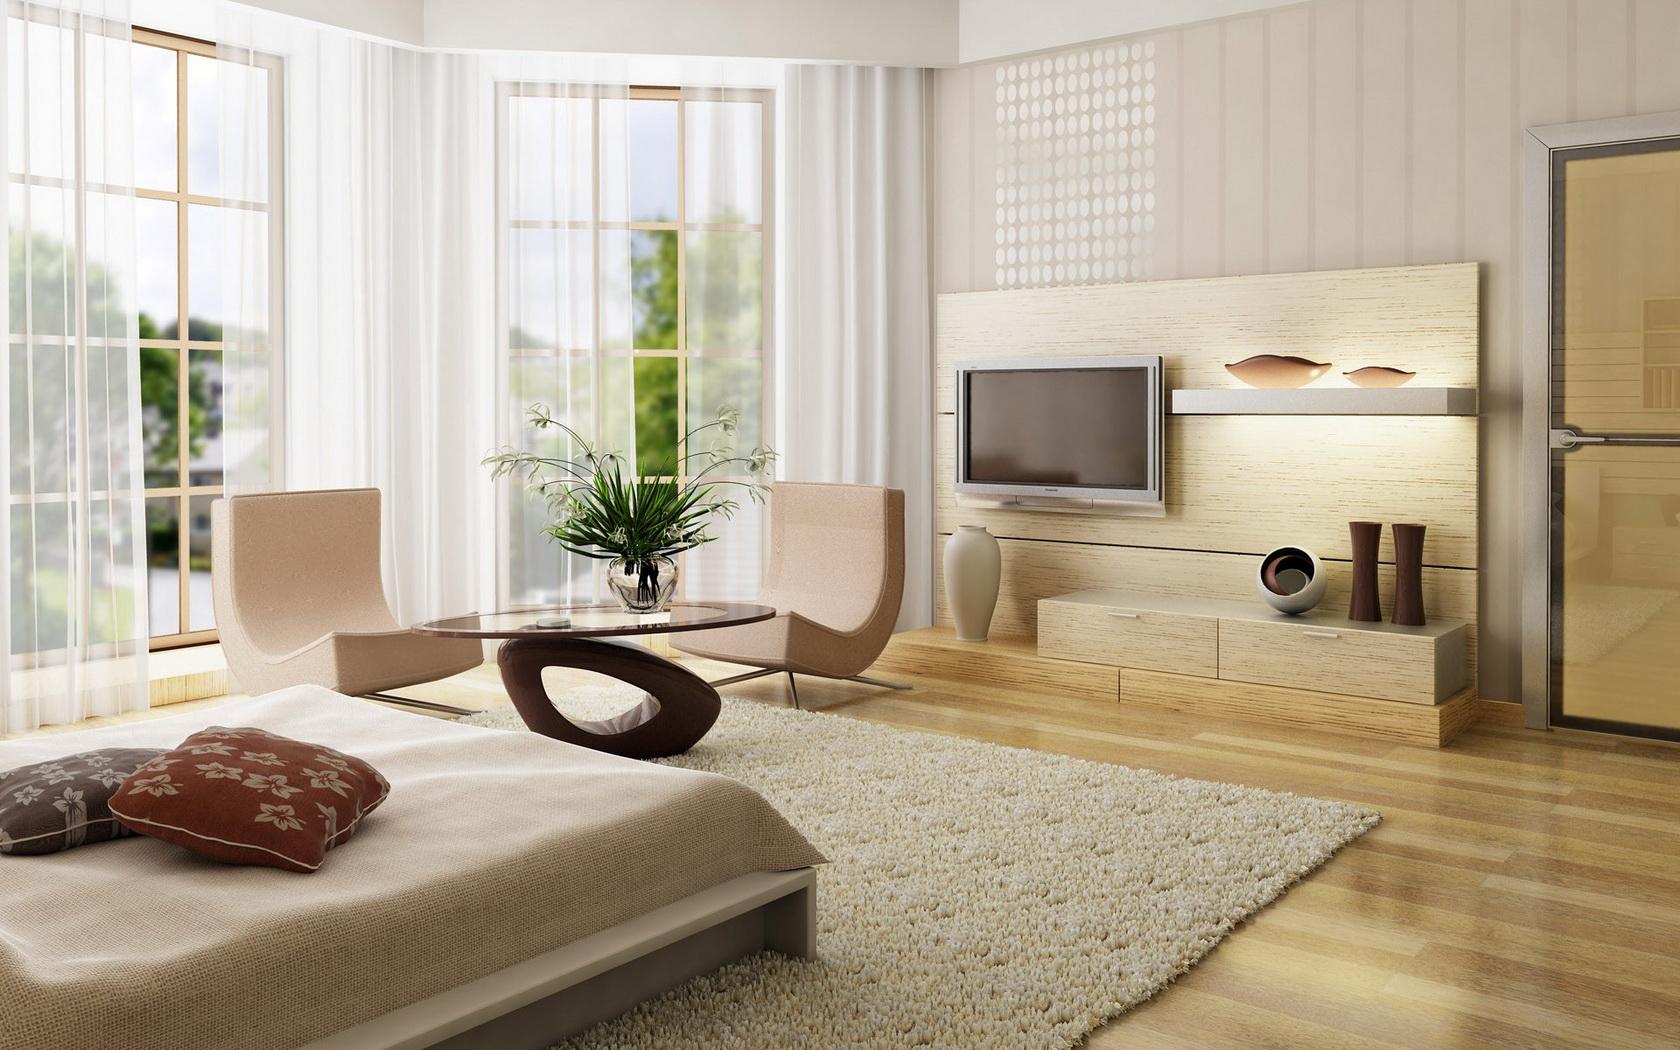 bedroom bed architecture interior design wallpaper 1680x1050 148309 wallpaperup - Bedroom Architecture Design